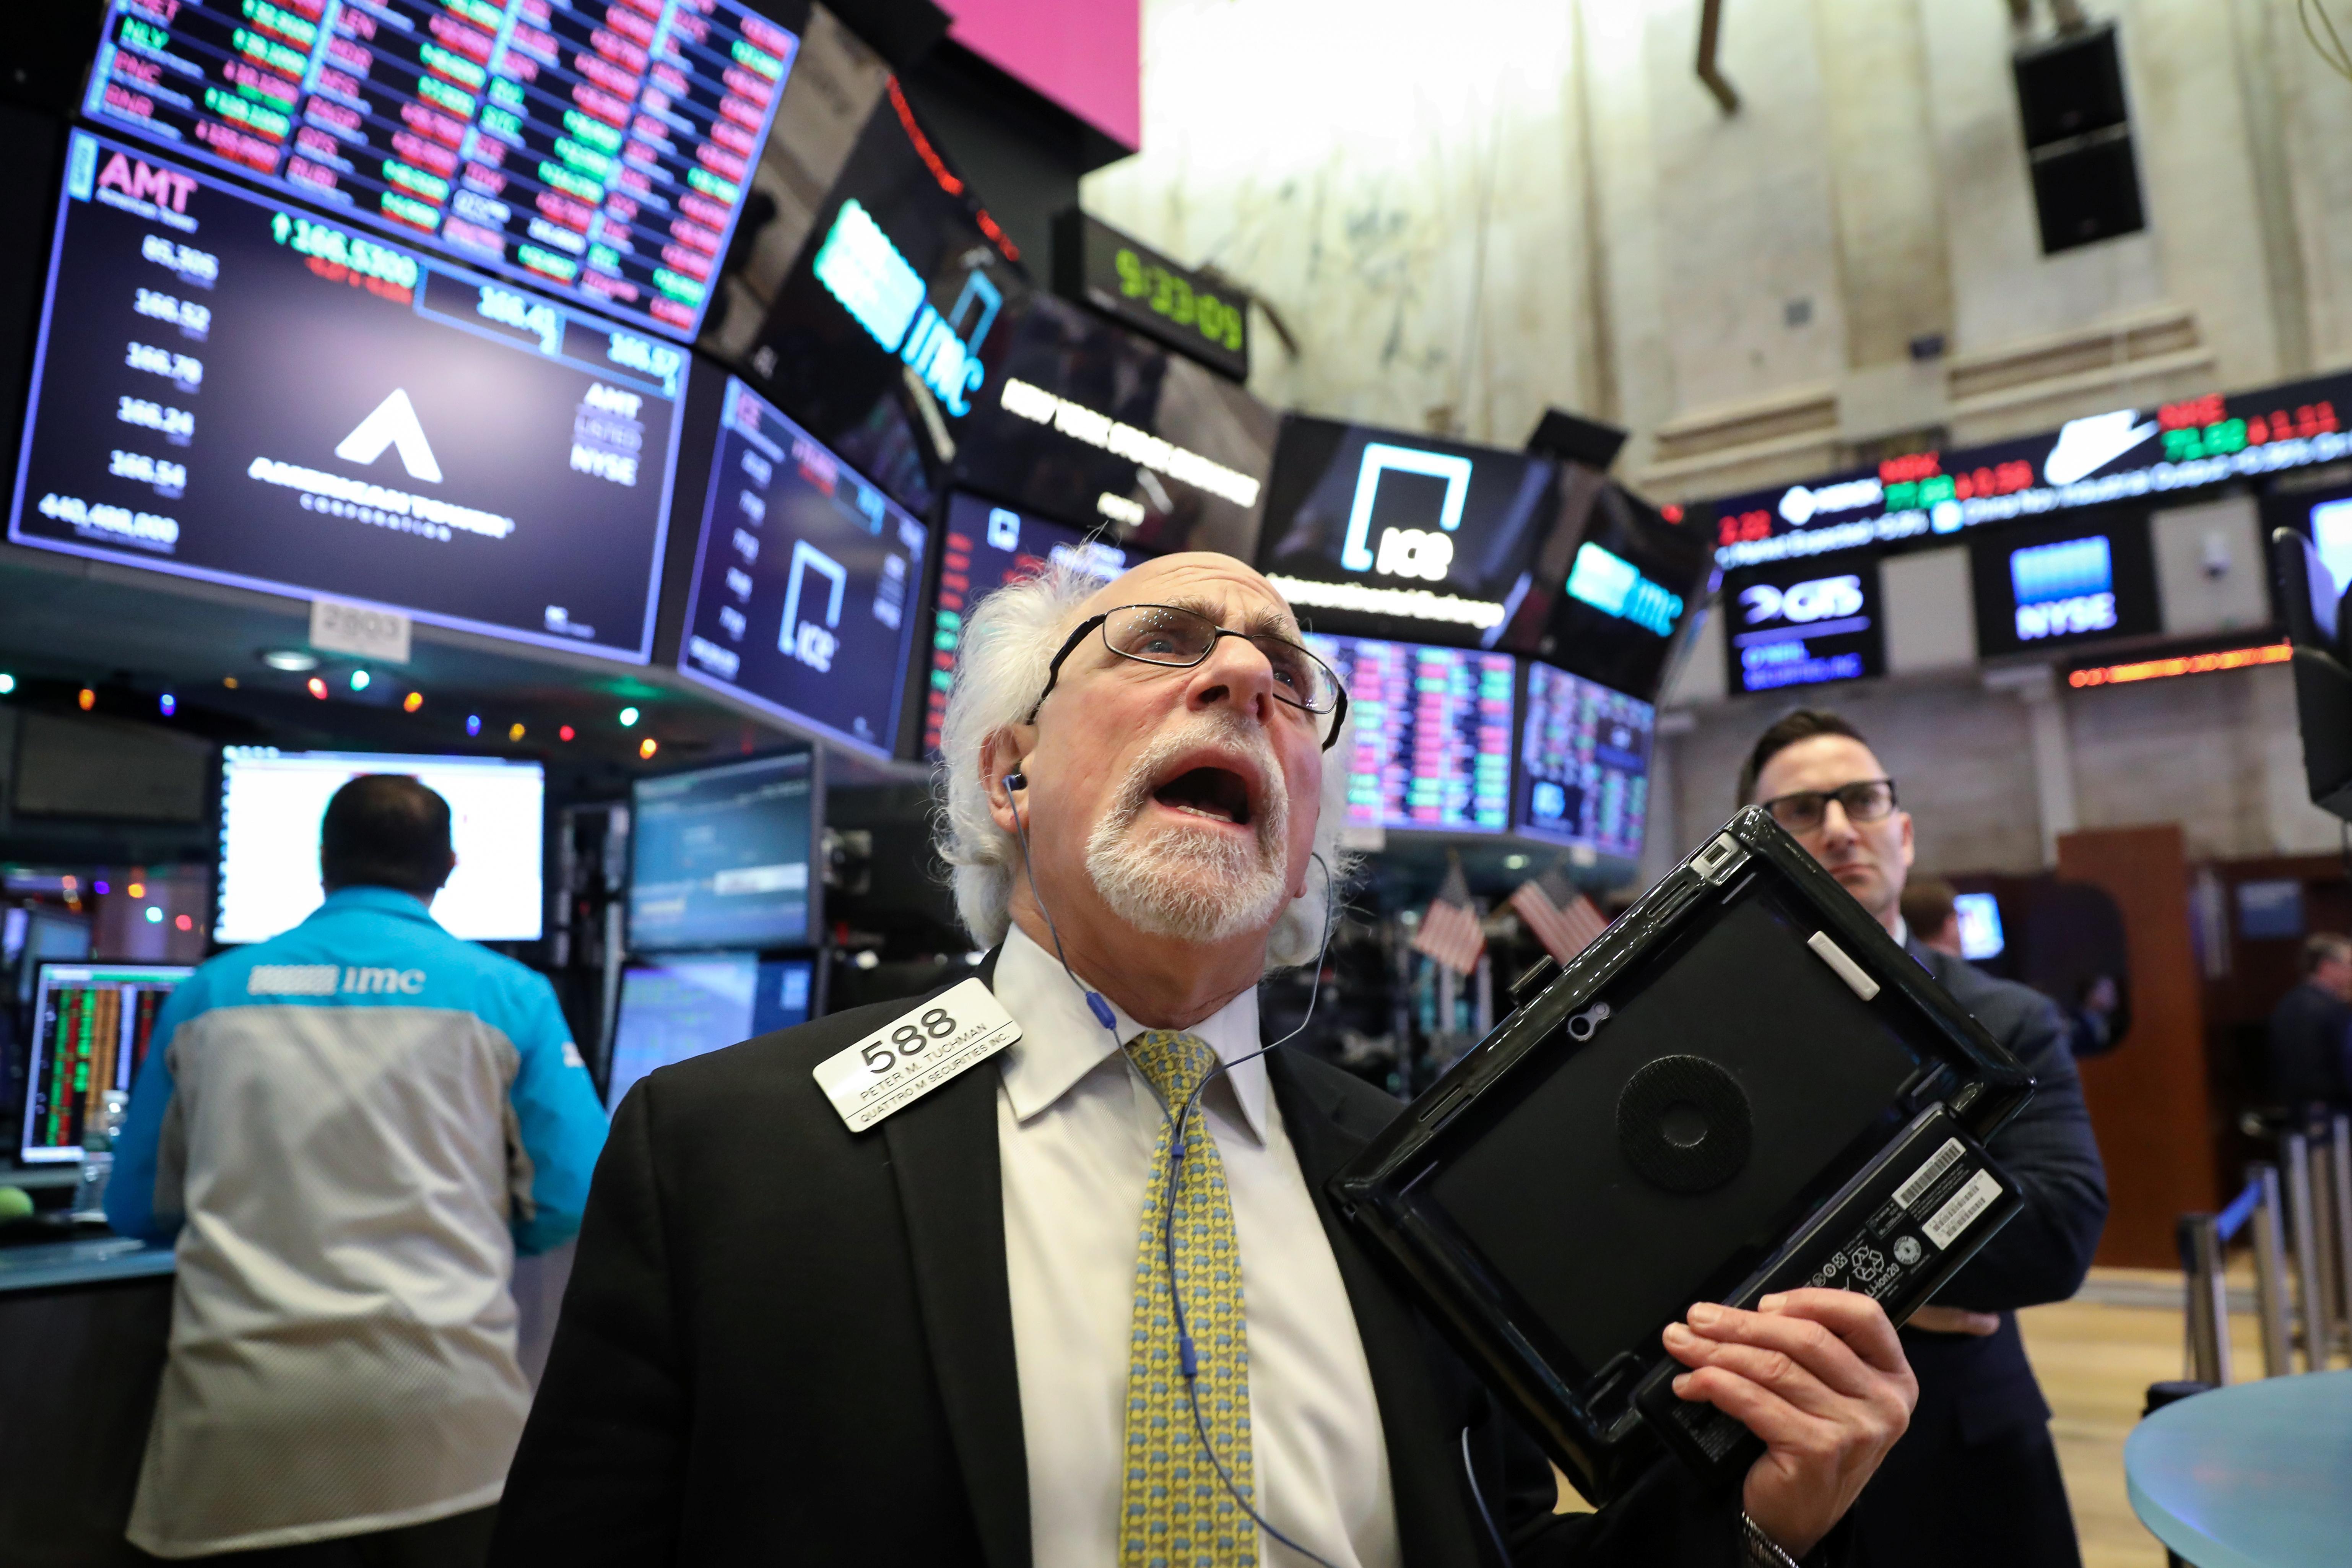 Keep your cool during market slide, says Comprehensive Wealth Management's John Vento